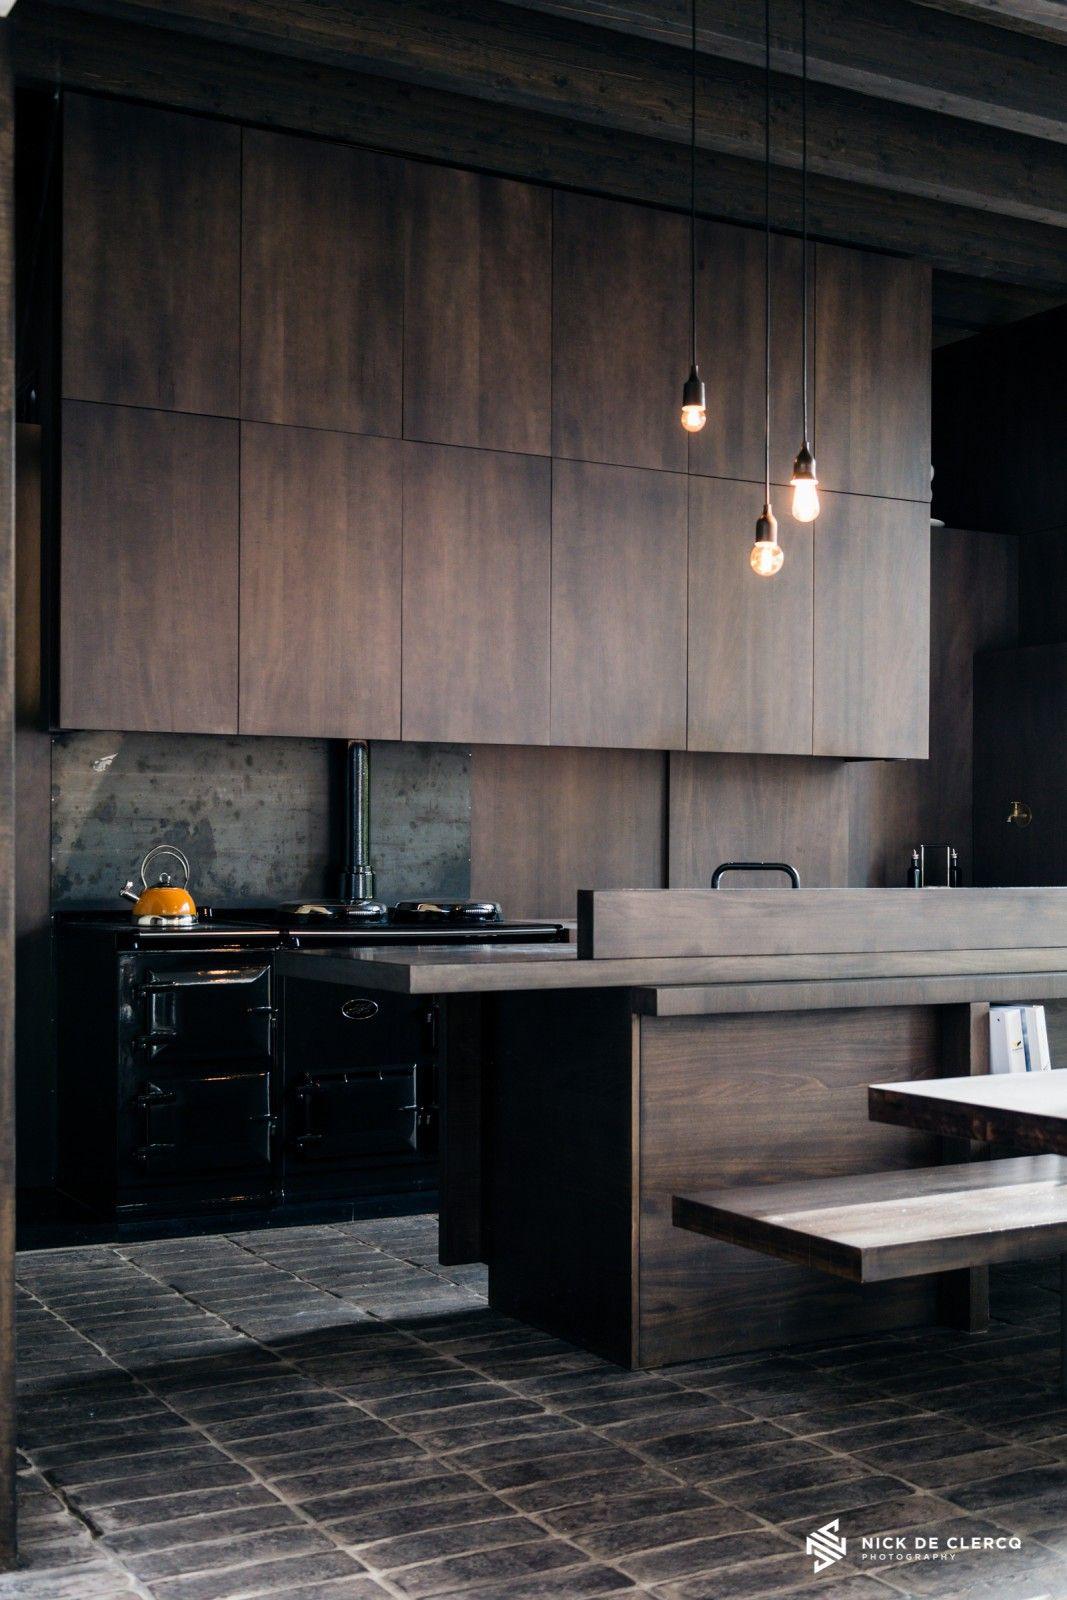 wabi sabi architecture nick de clercq photography 00. Black Bedroom Furniture Sets. Home Design Ideas